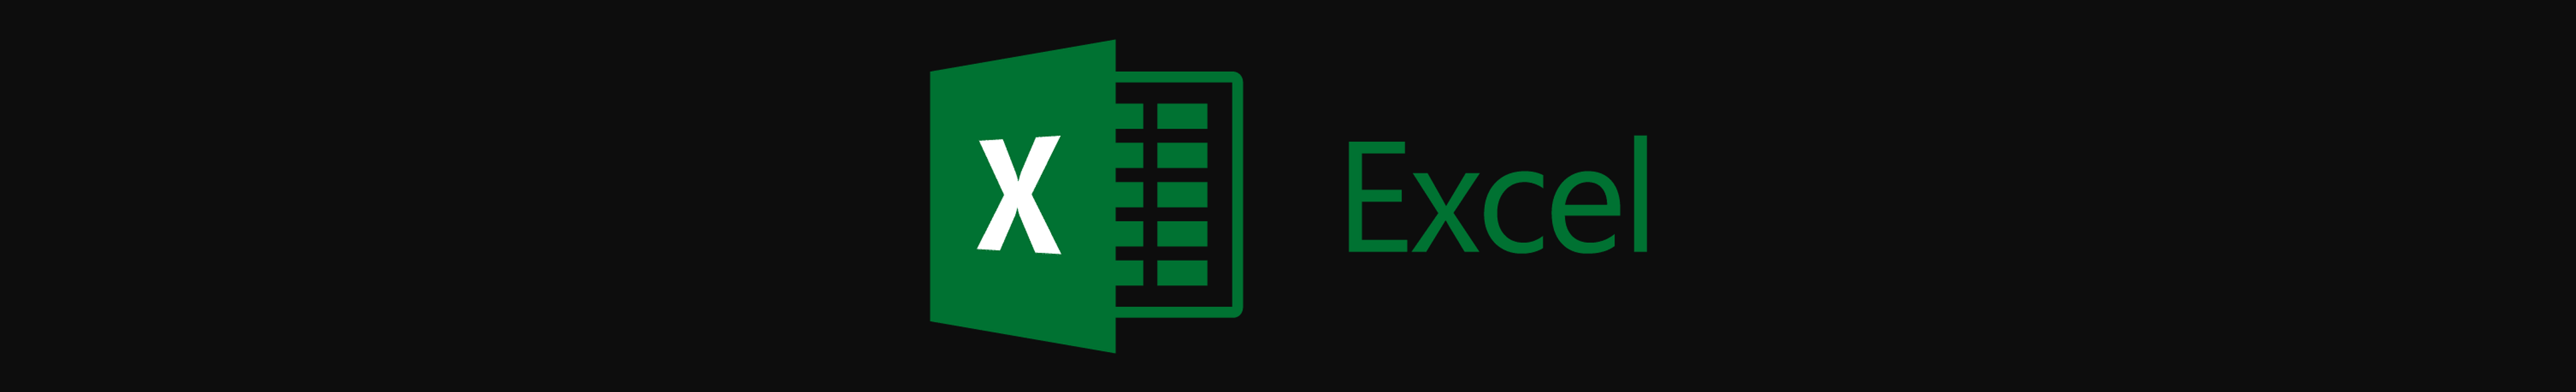 Microsoft Excel Logo - Top 10 Data Analytics Tools - Edureka